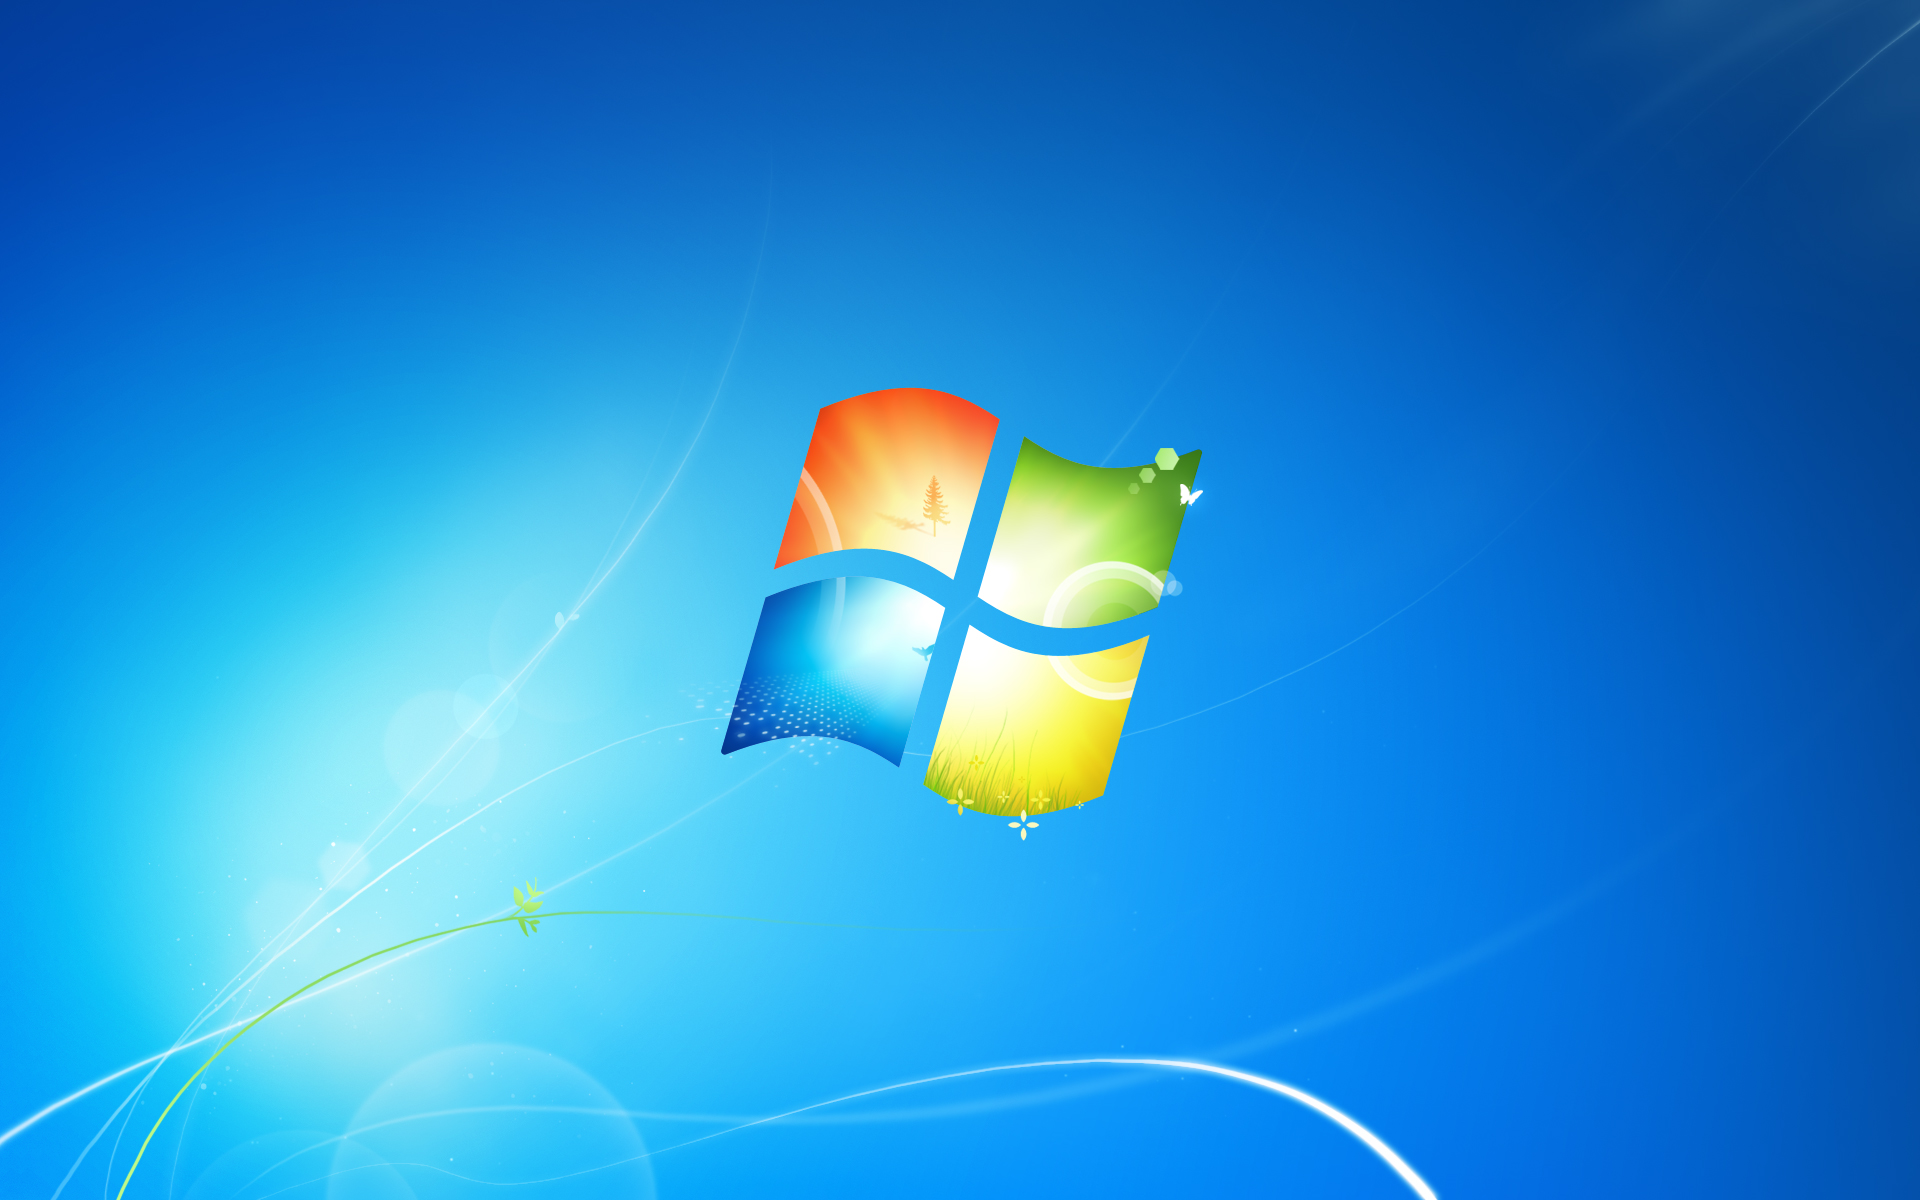 Desktop Background   Change   Windows 7 Help Forums 1920x1200